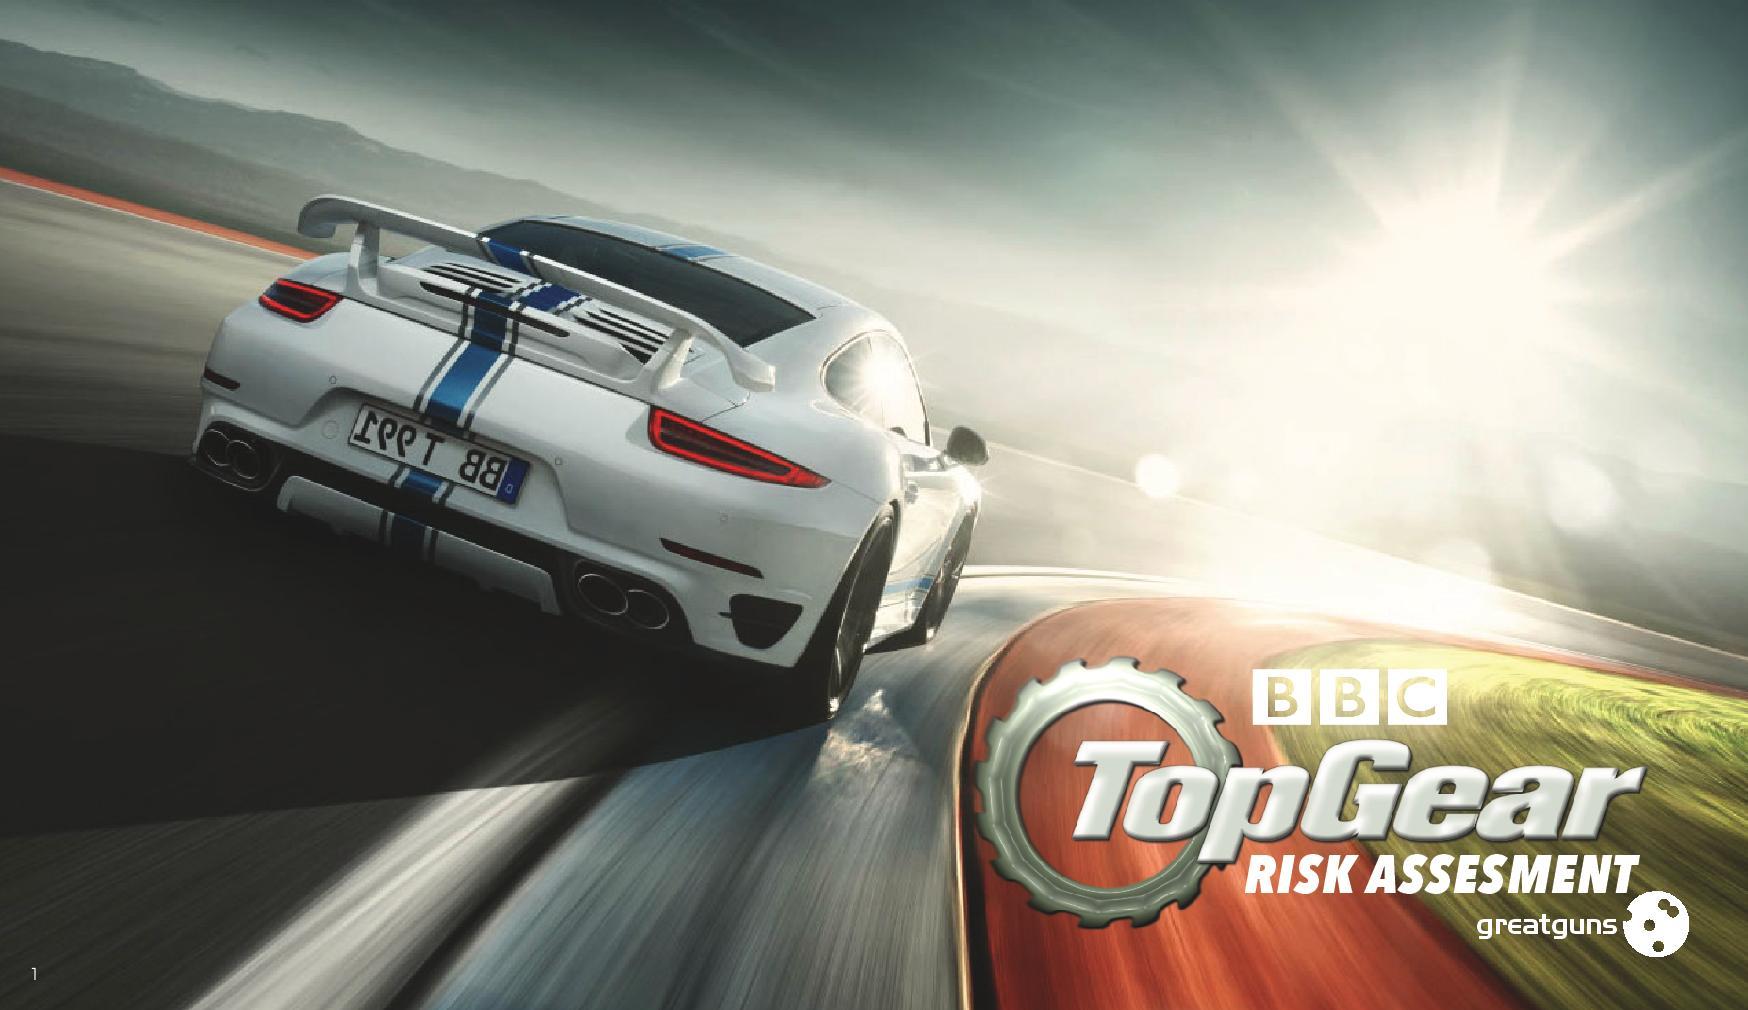 Top Gear-page-001.jpg